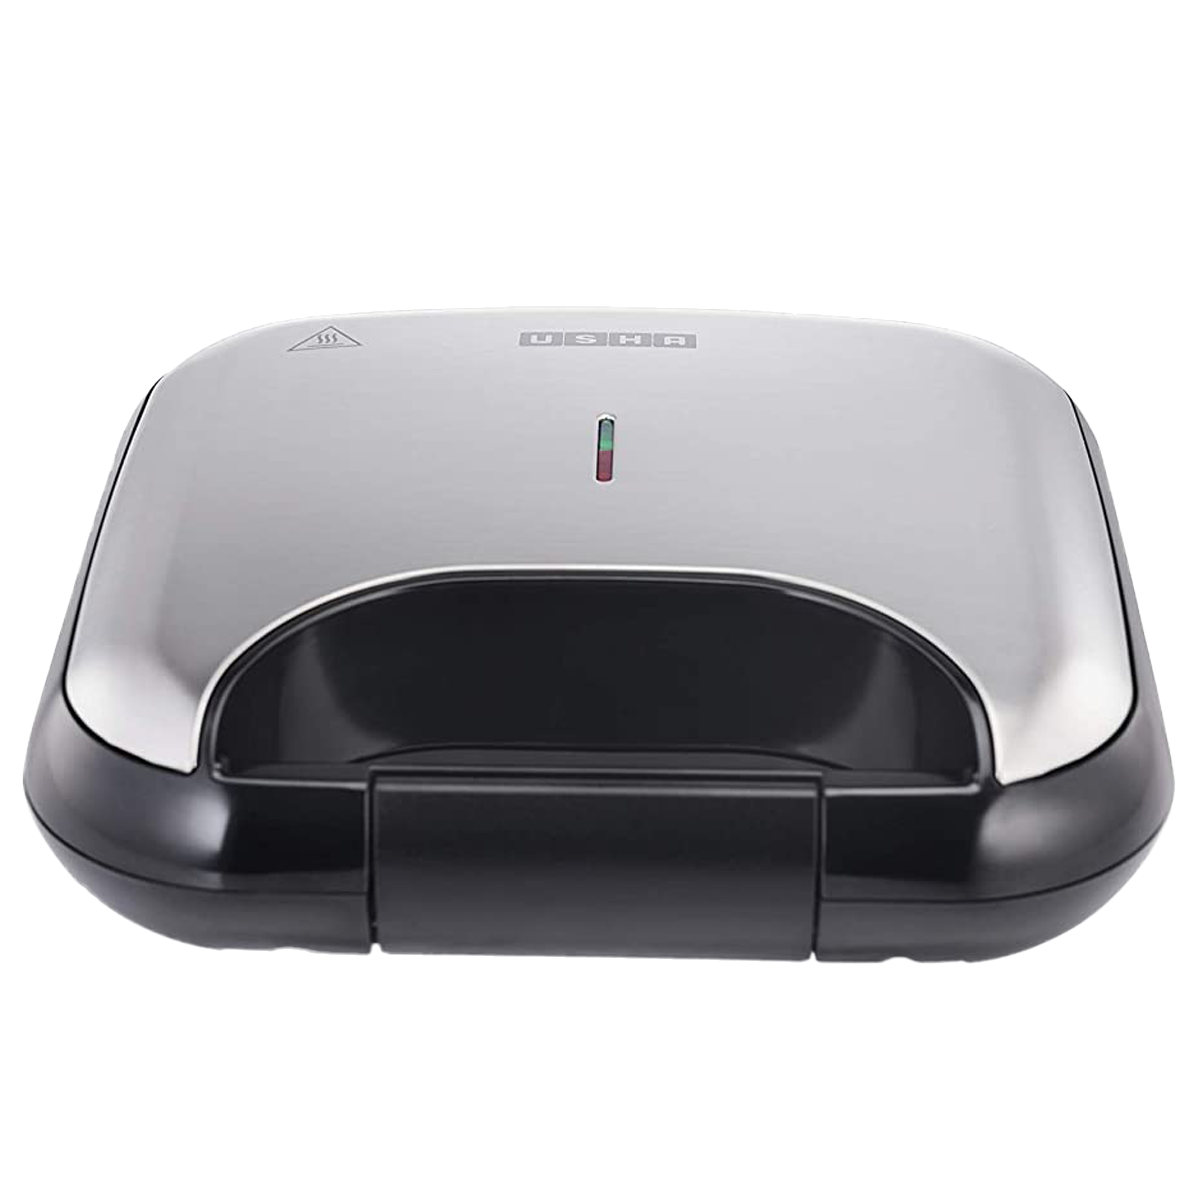 Usha 750 Watt 4 Slice Sandwich Toaster (ST 3772, Black)